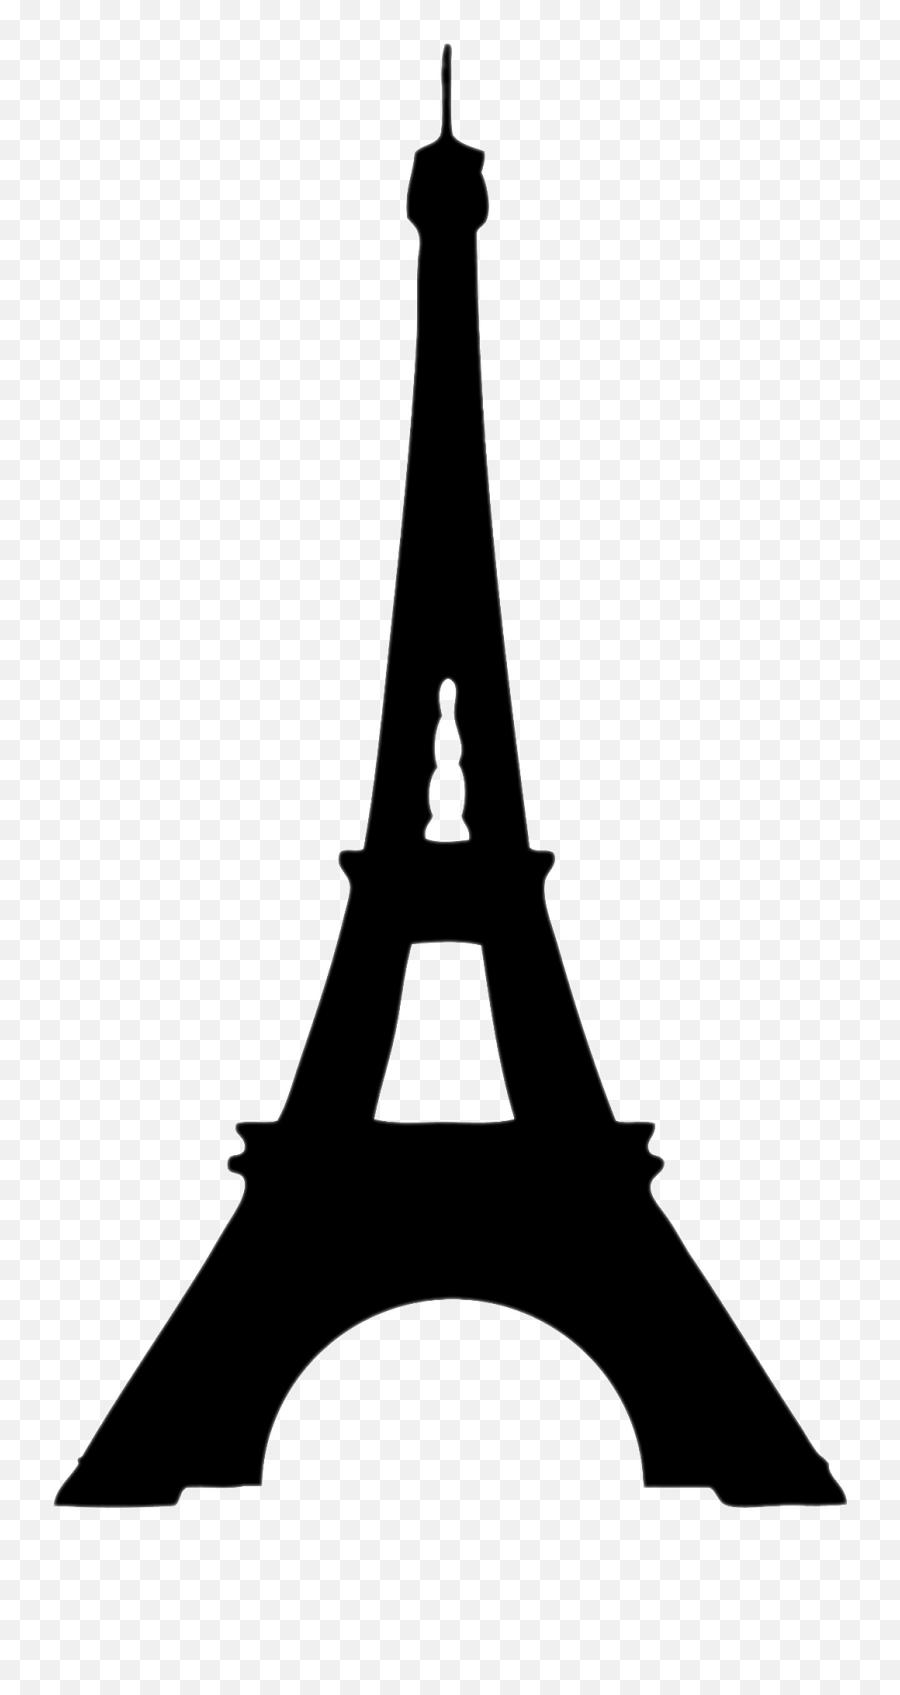 Eiffel Tower Png - Eiffel Tower Clip Art Emoji,Is There An Eiffel Tower Emoji